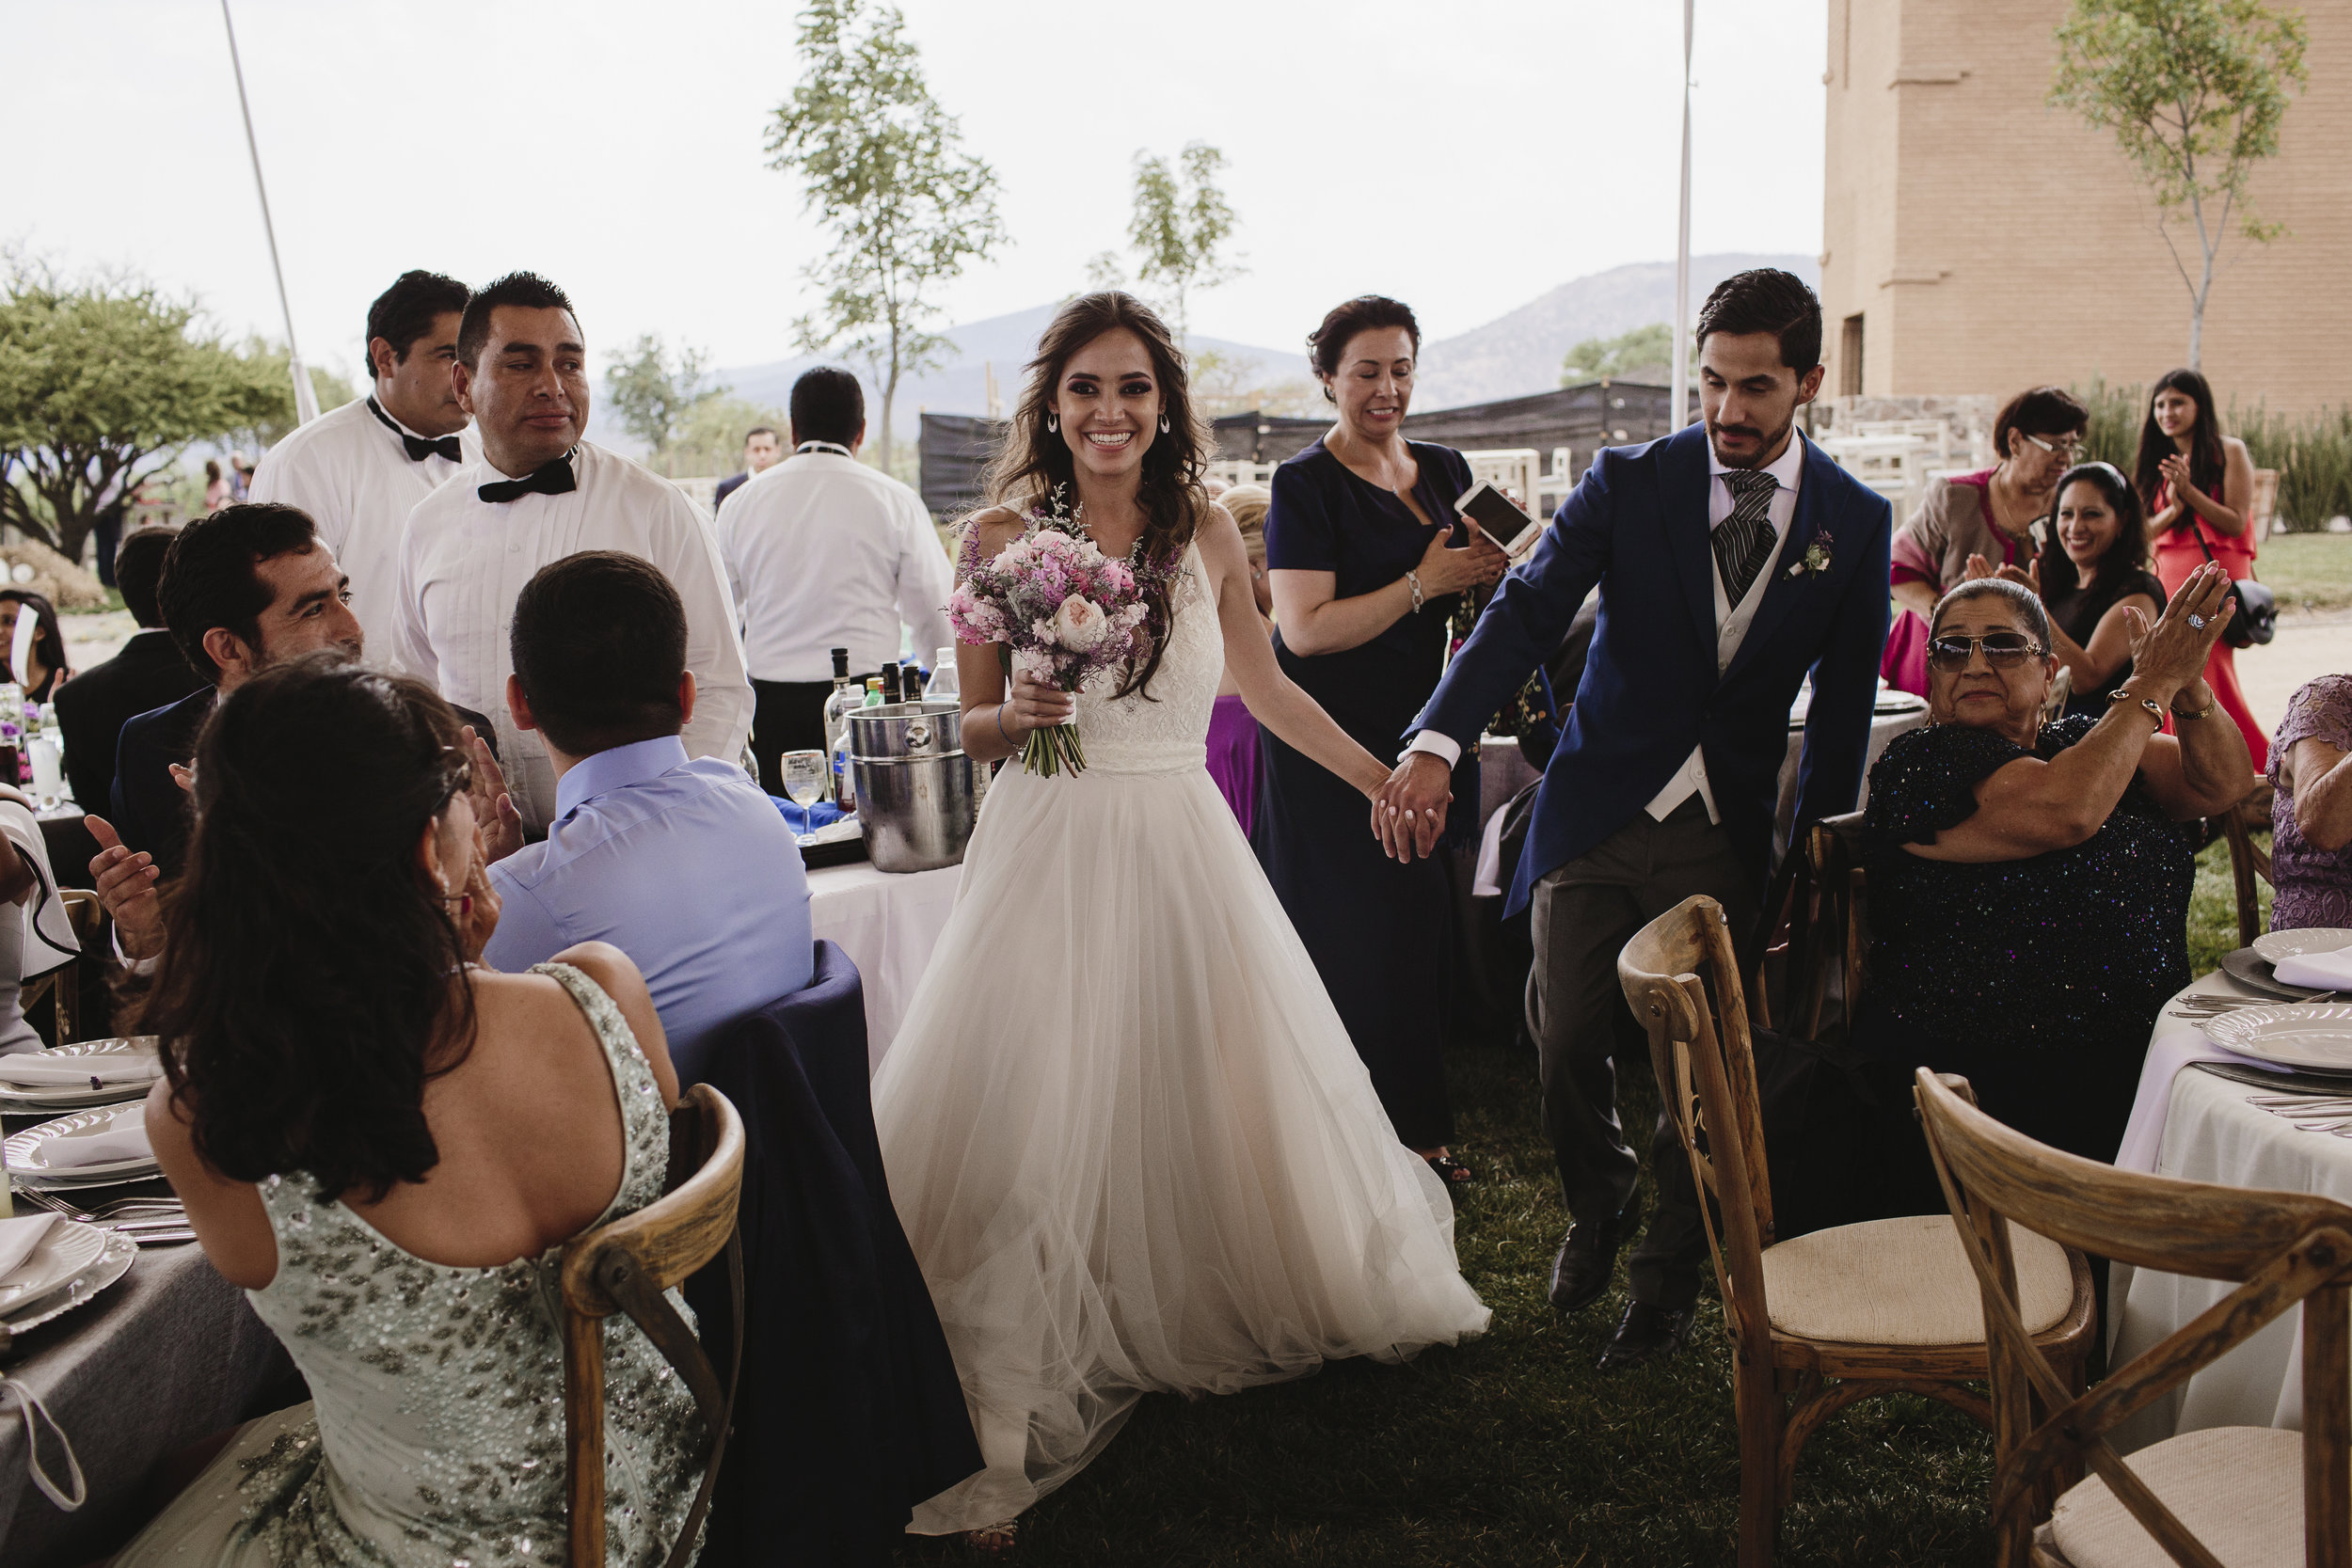 alfons_flores_destination_wedding_photography_mavi_david-1355.JPG